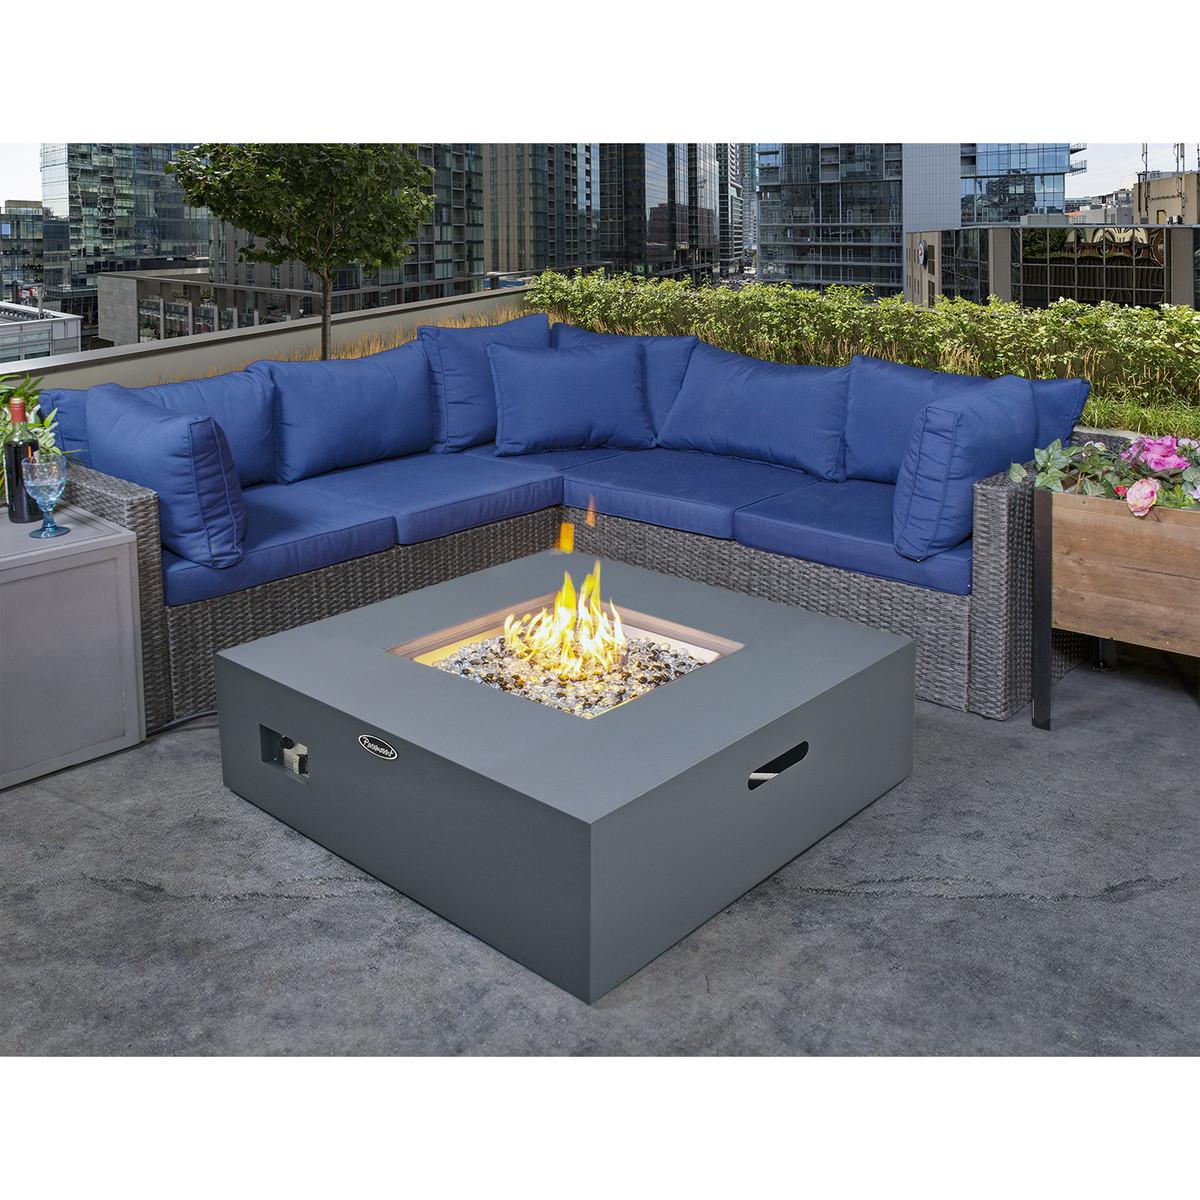 Paramount Concrete Look Aluminum Fire Table, Low Square